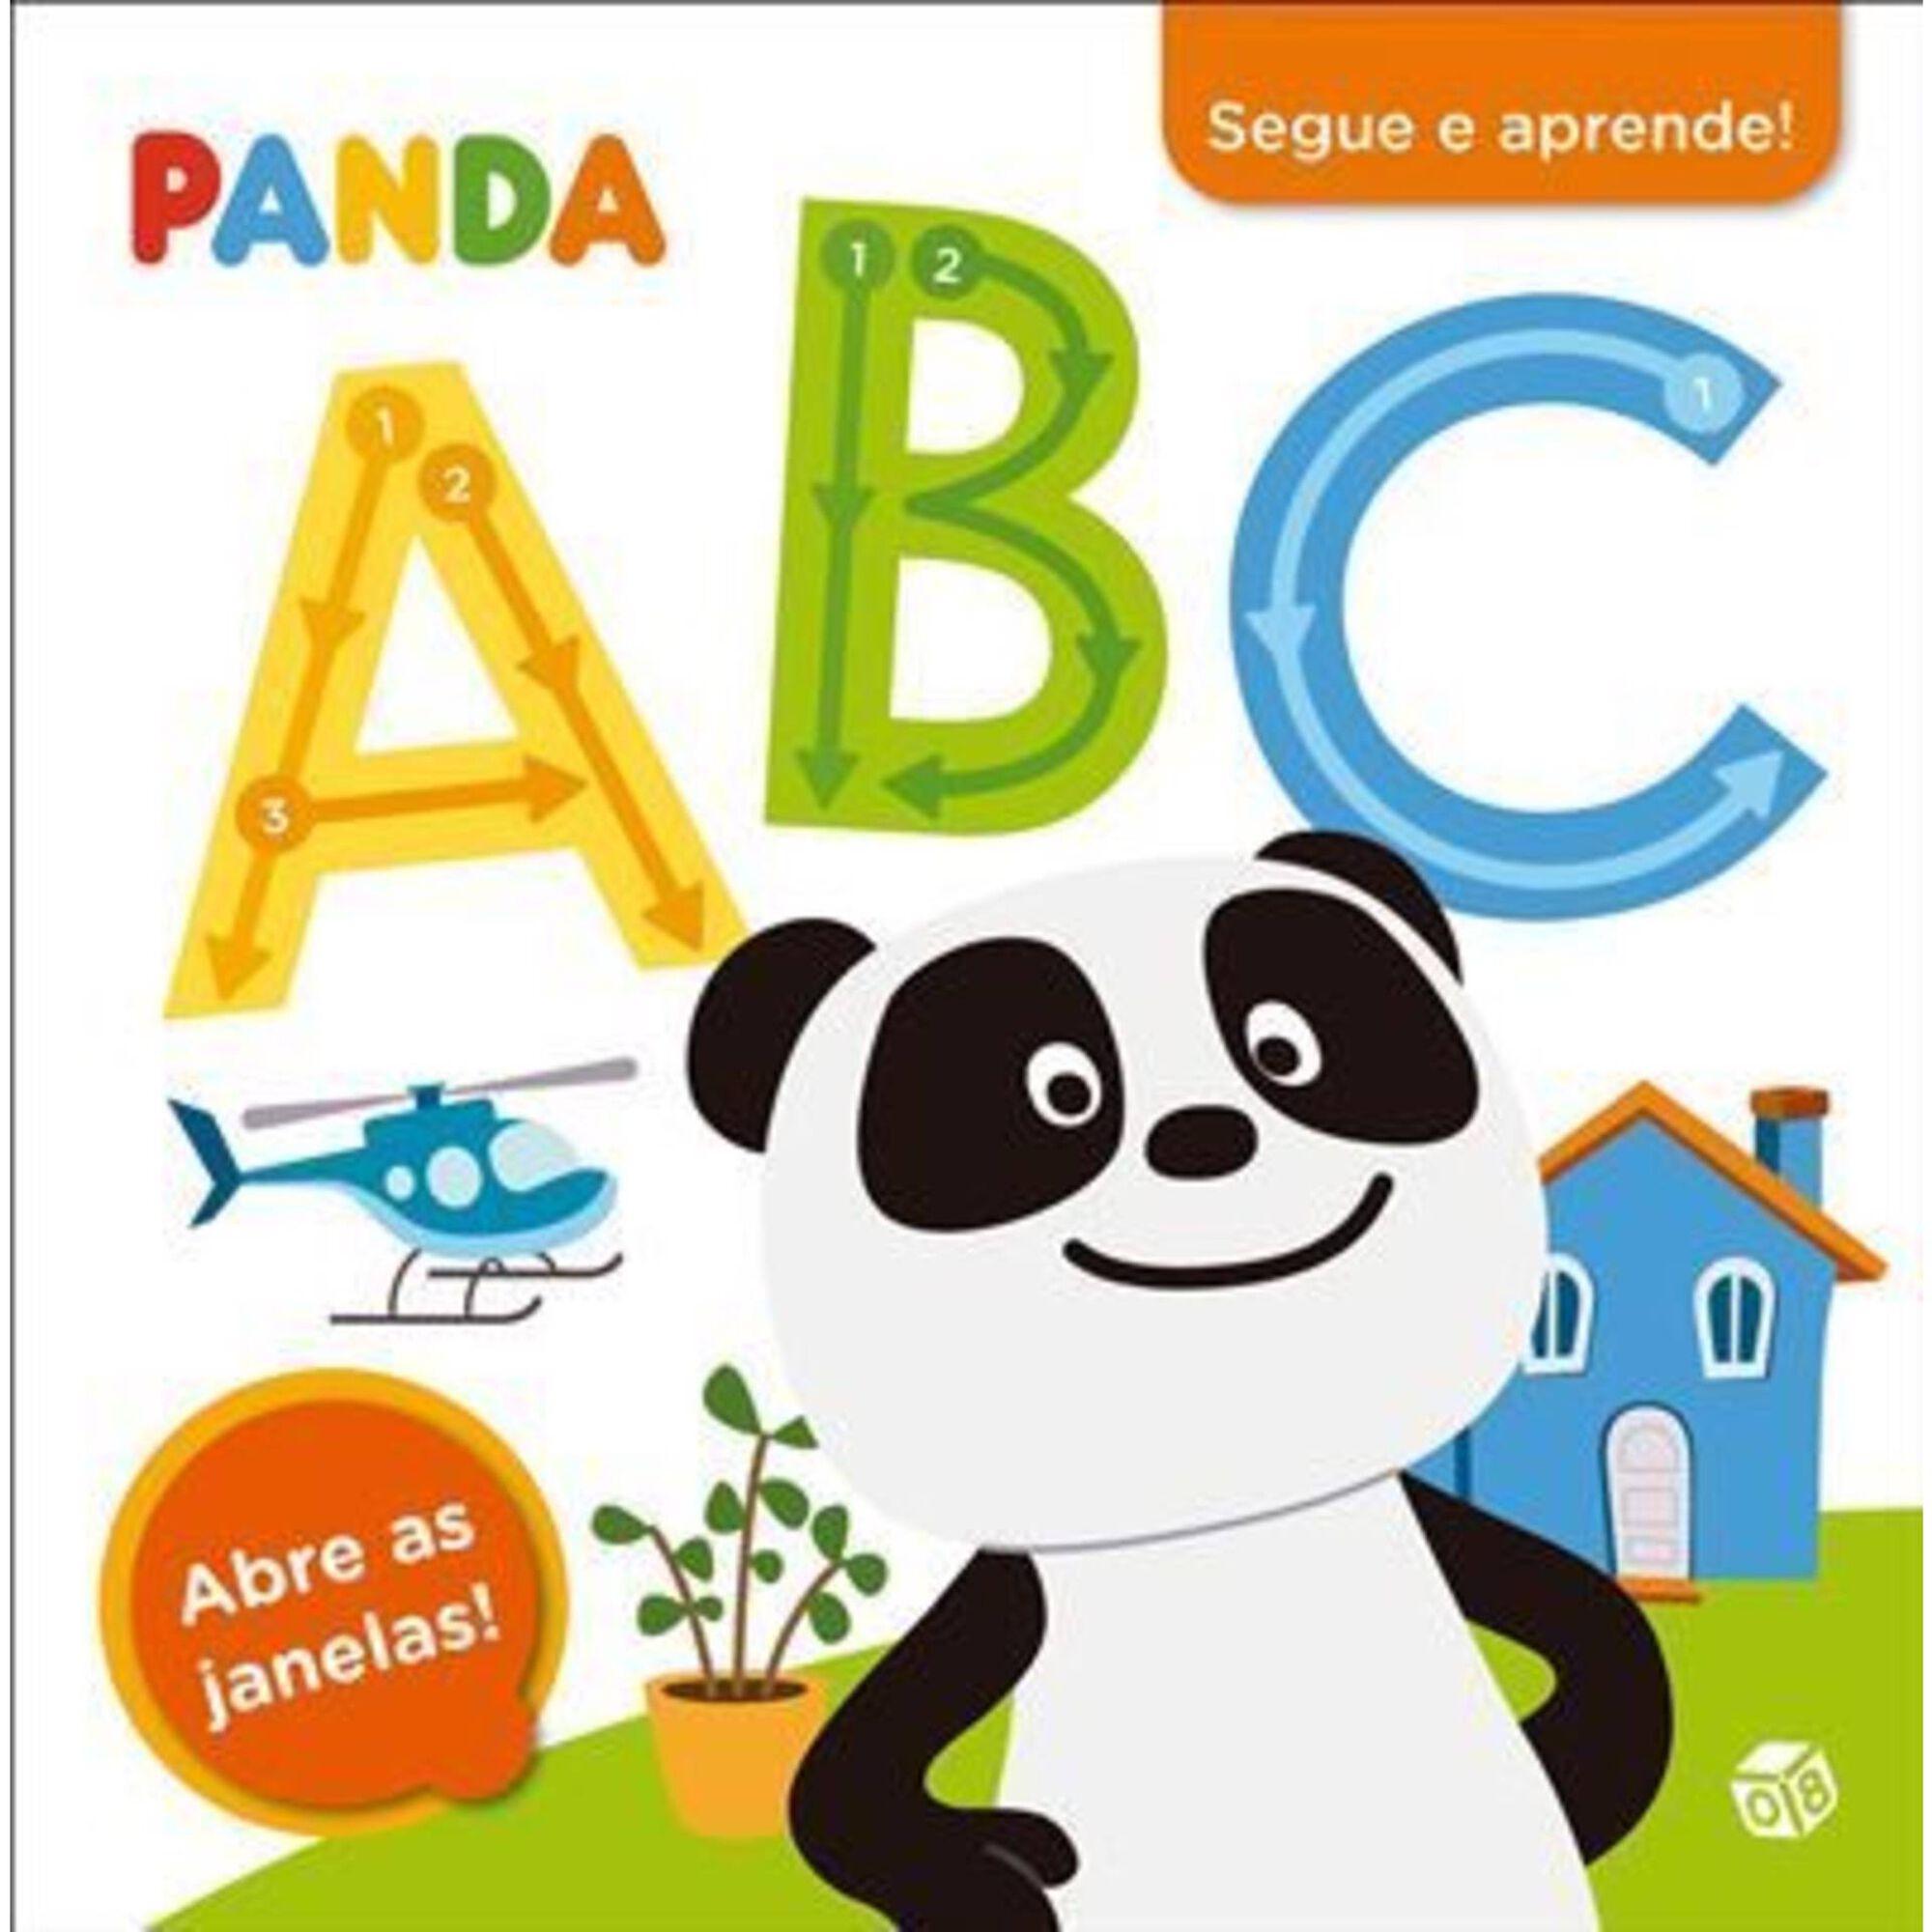 Panda - Segue e Aprende! ABC